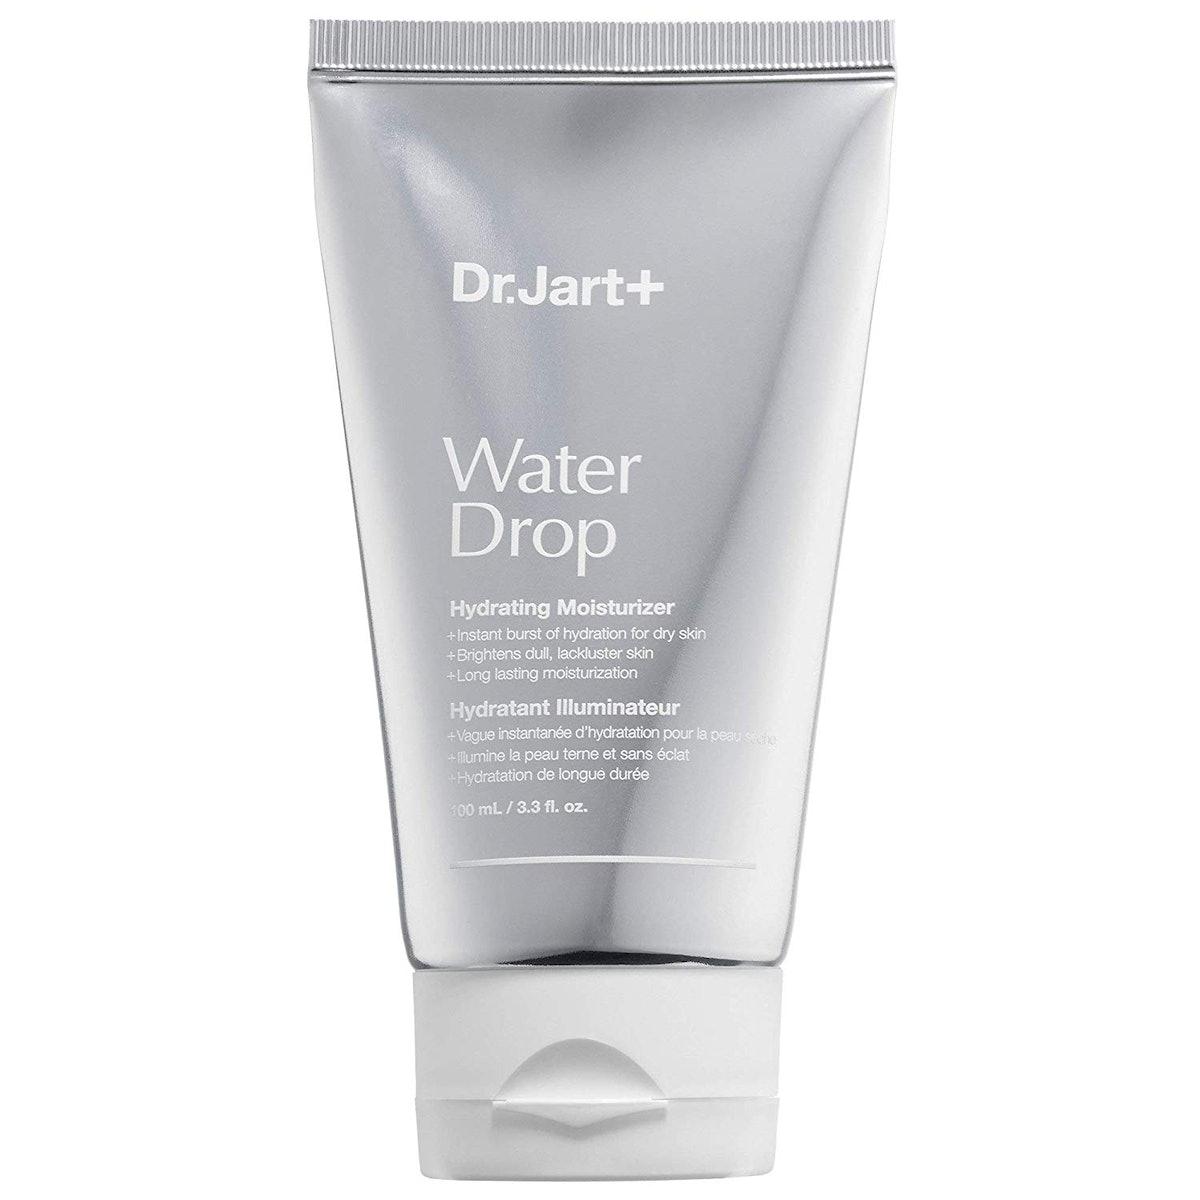 Dr. Jart Water Drop Hydrating Moisturizer